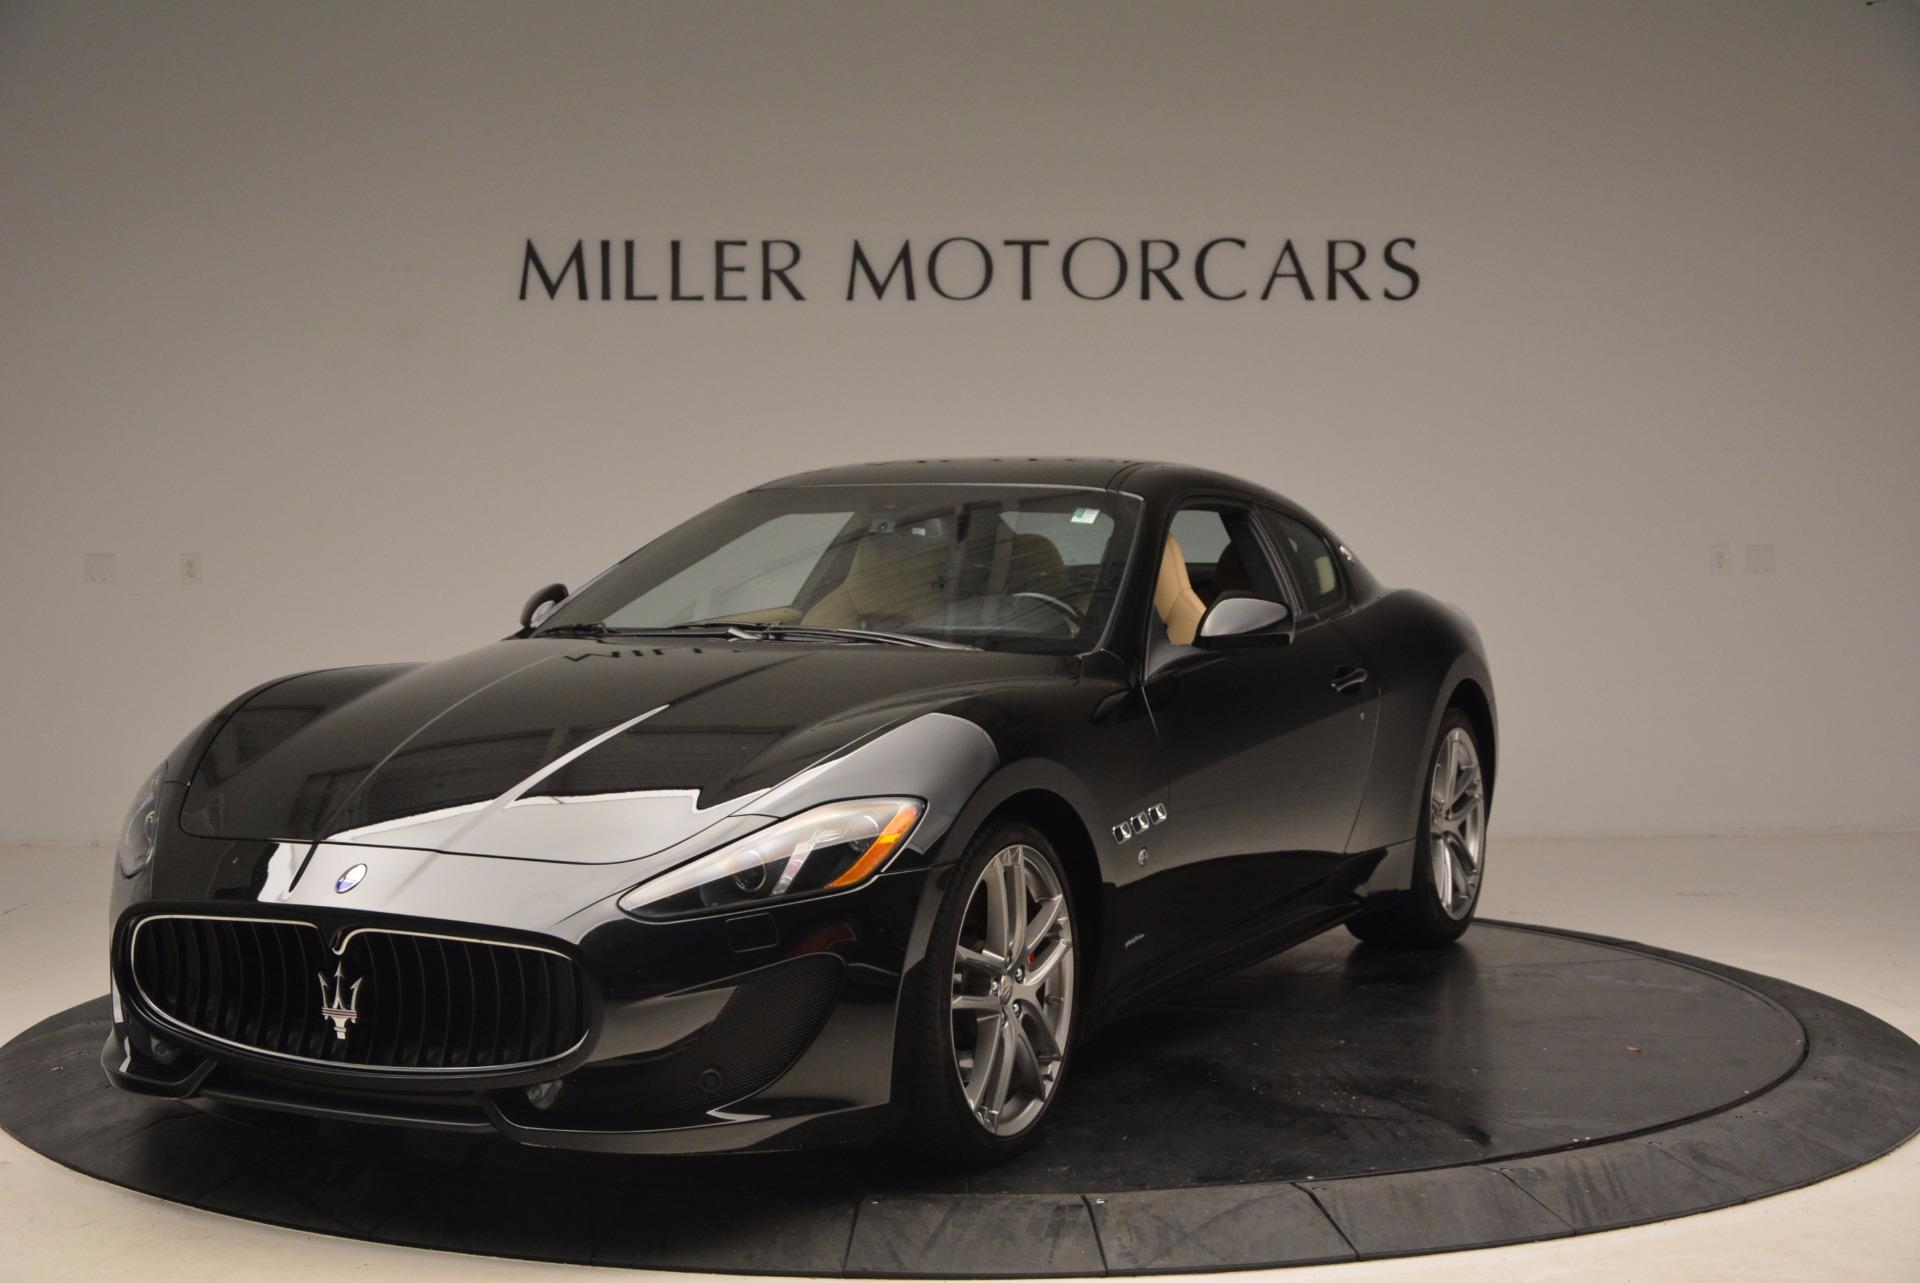 Used 2015 Maserati GranTurismo Sport Coupe for sale Sold at Alfa Romeo of Westport in Westport CT 06880 1